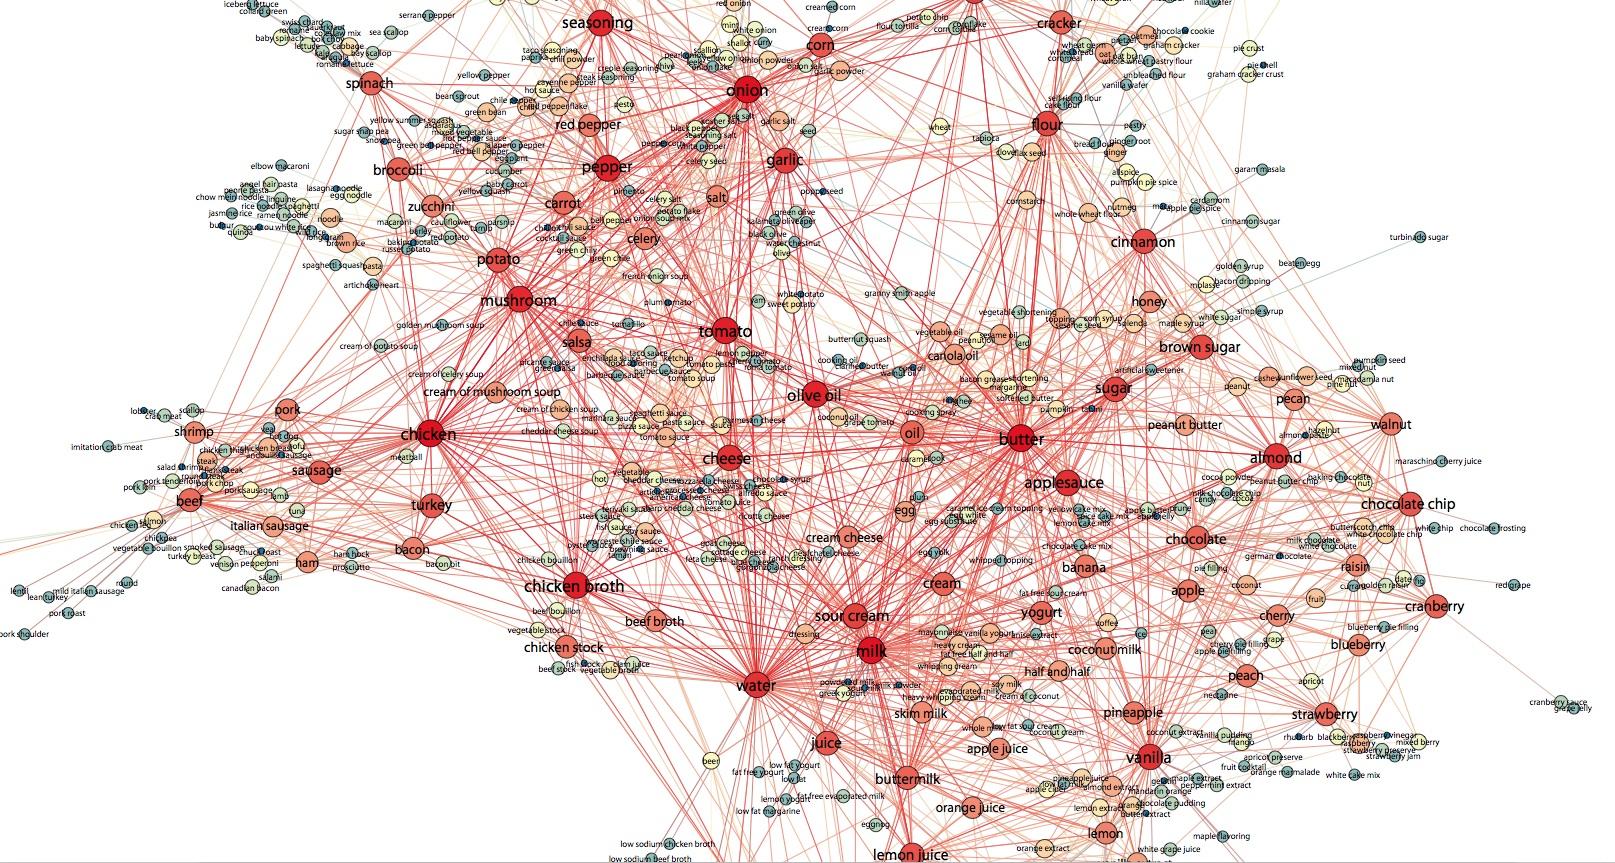 Recipe recommendation using ingredient networks ladamics blog 3 forumfinder Gallery